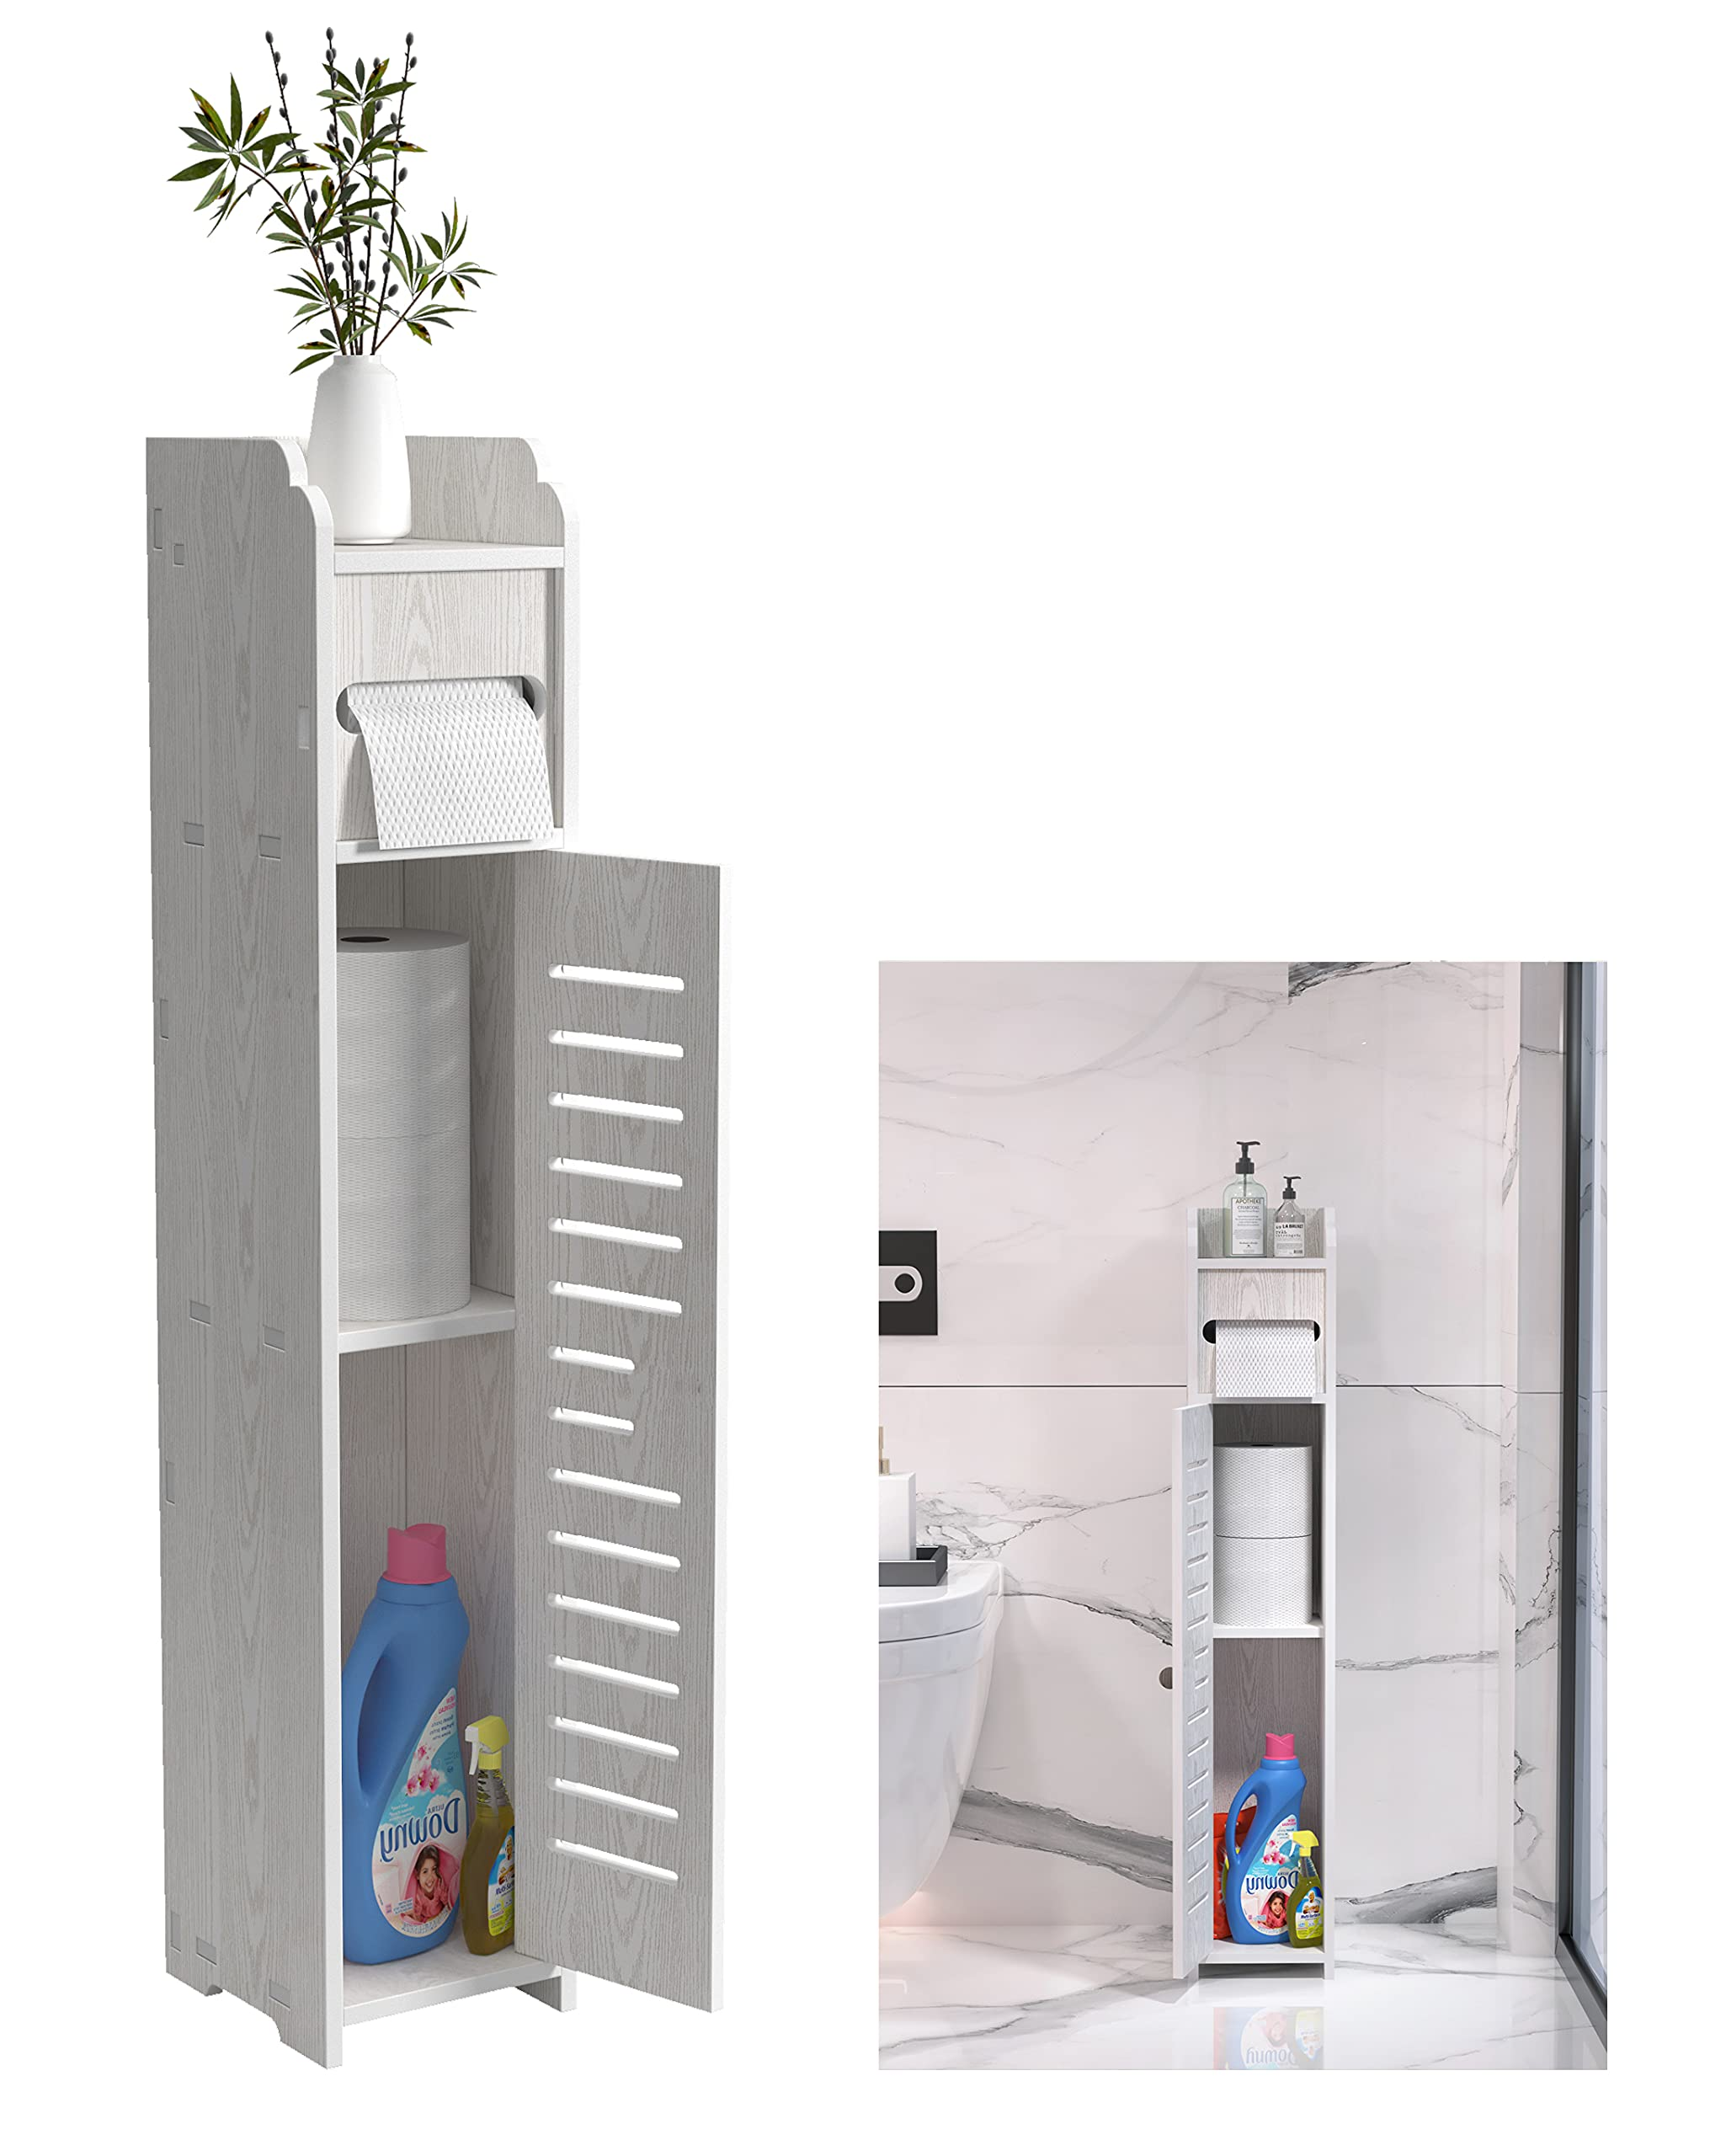 Doxo Small Bathroom Storage Cabinet Floor Cabinet with Doors and ShelvesBathroom Organizer